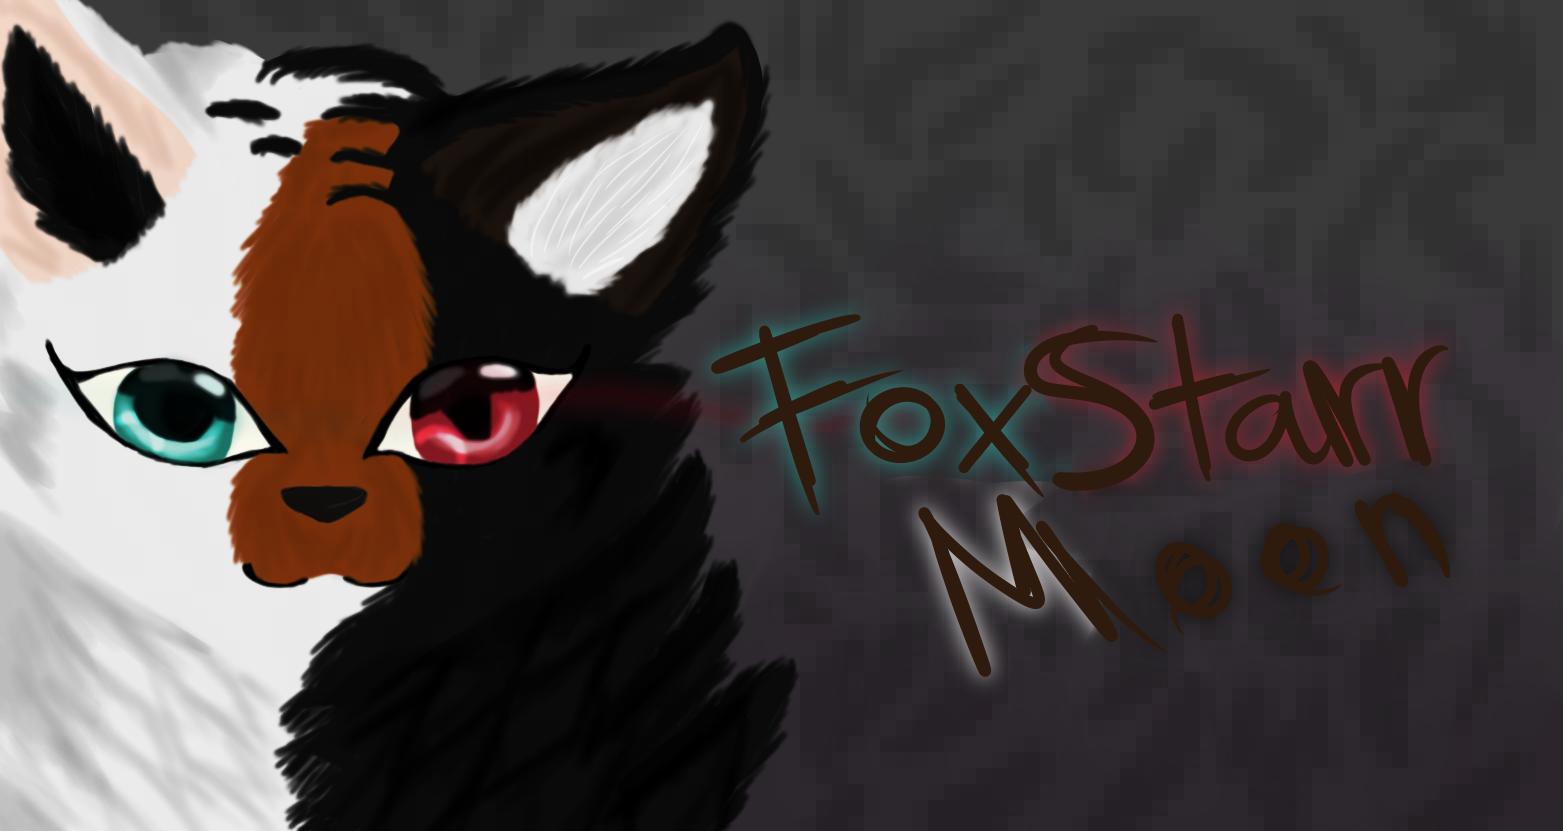 FoxStarrMoon's Profile Picture